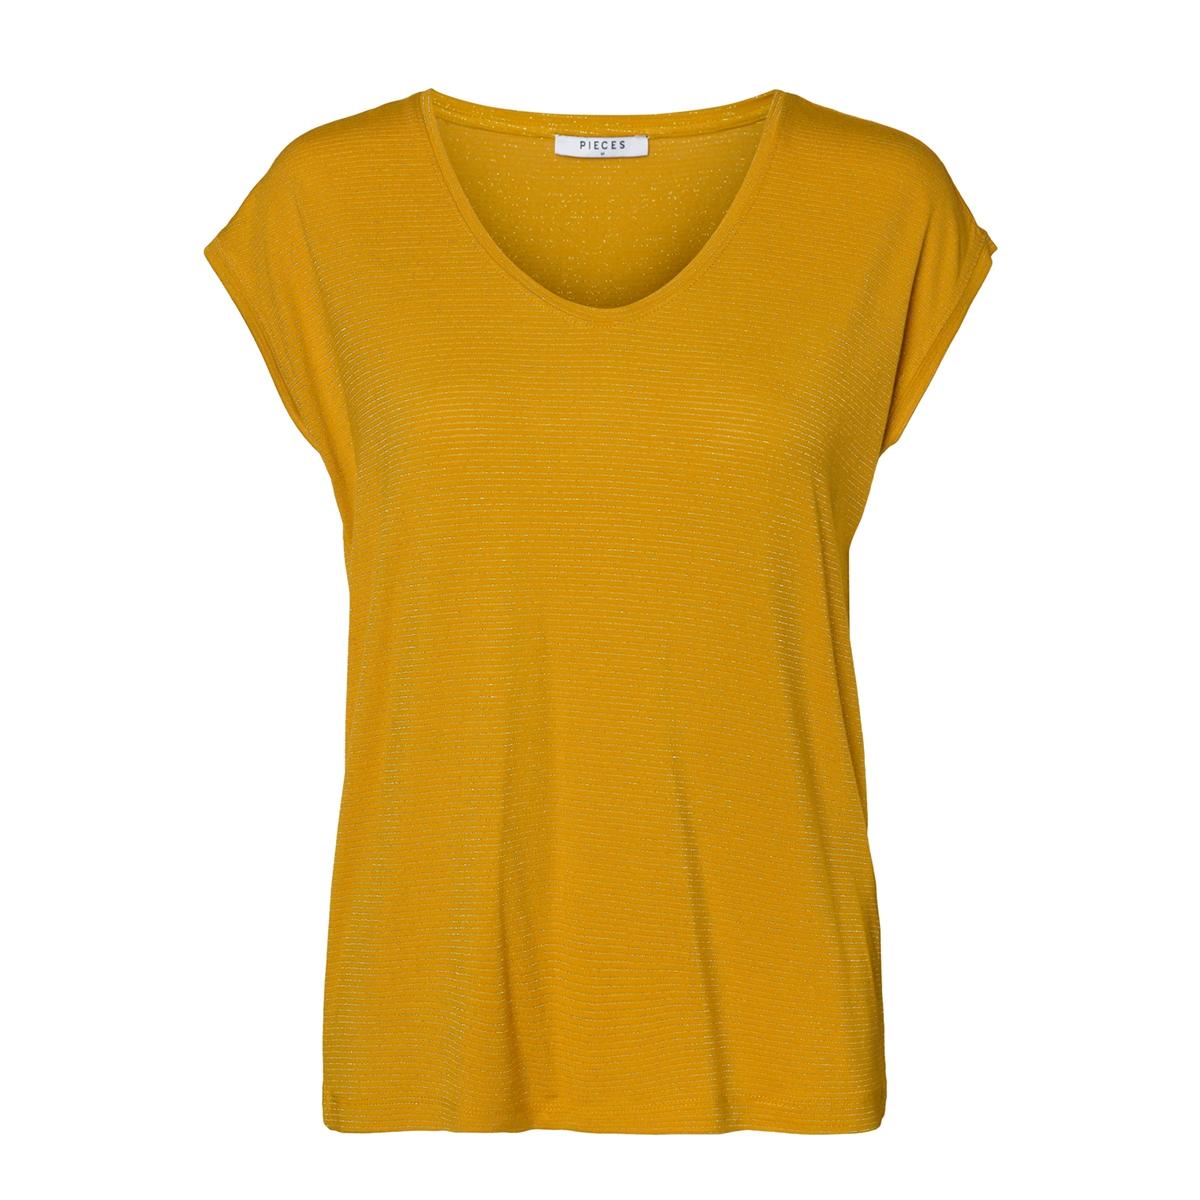 pcbillo tee lurex stripes noos 17078572 pieces t-shirt nugget gold/gold lurex